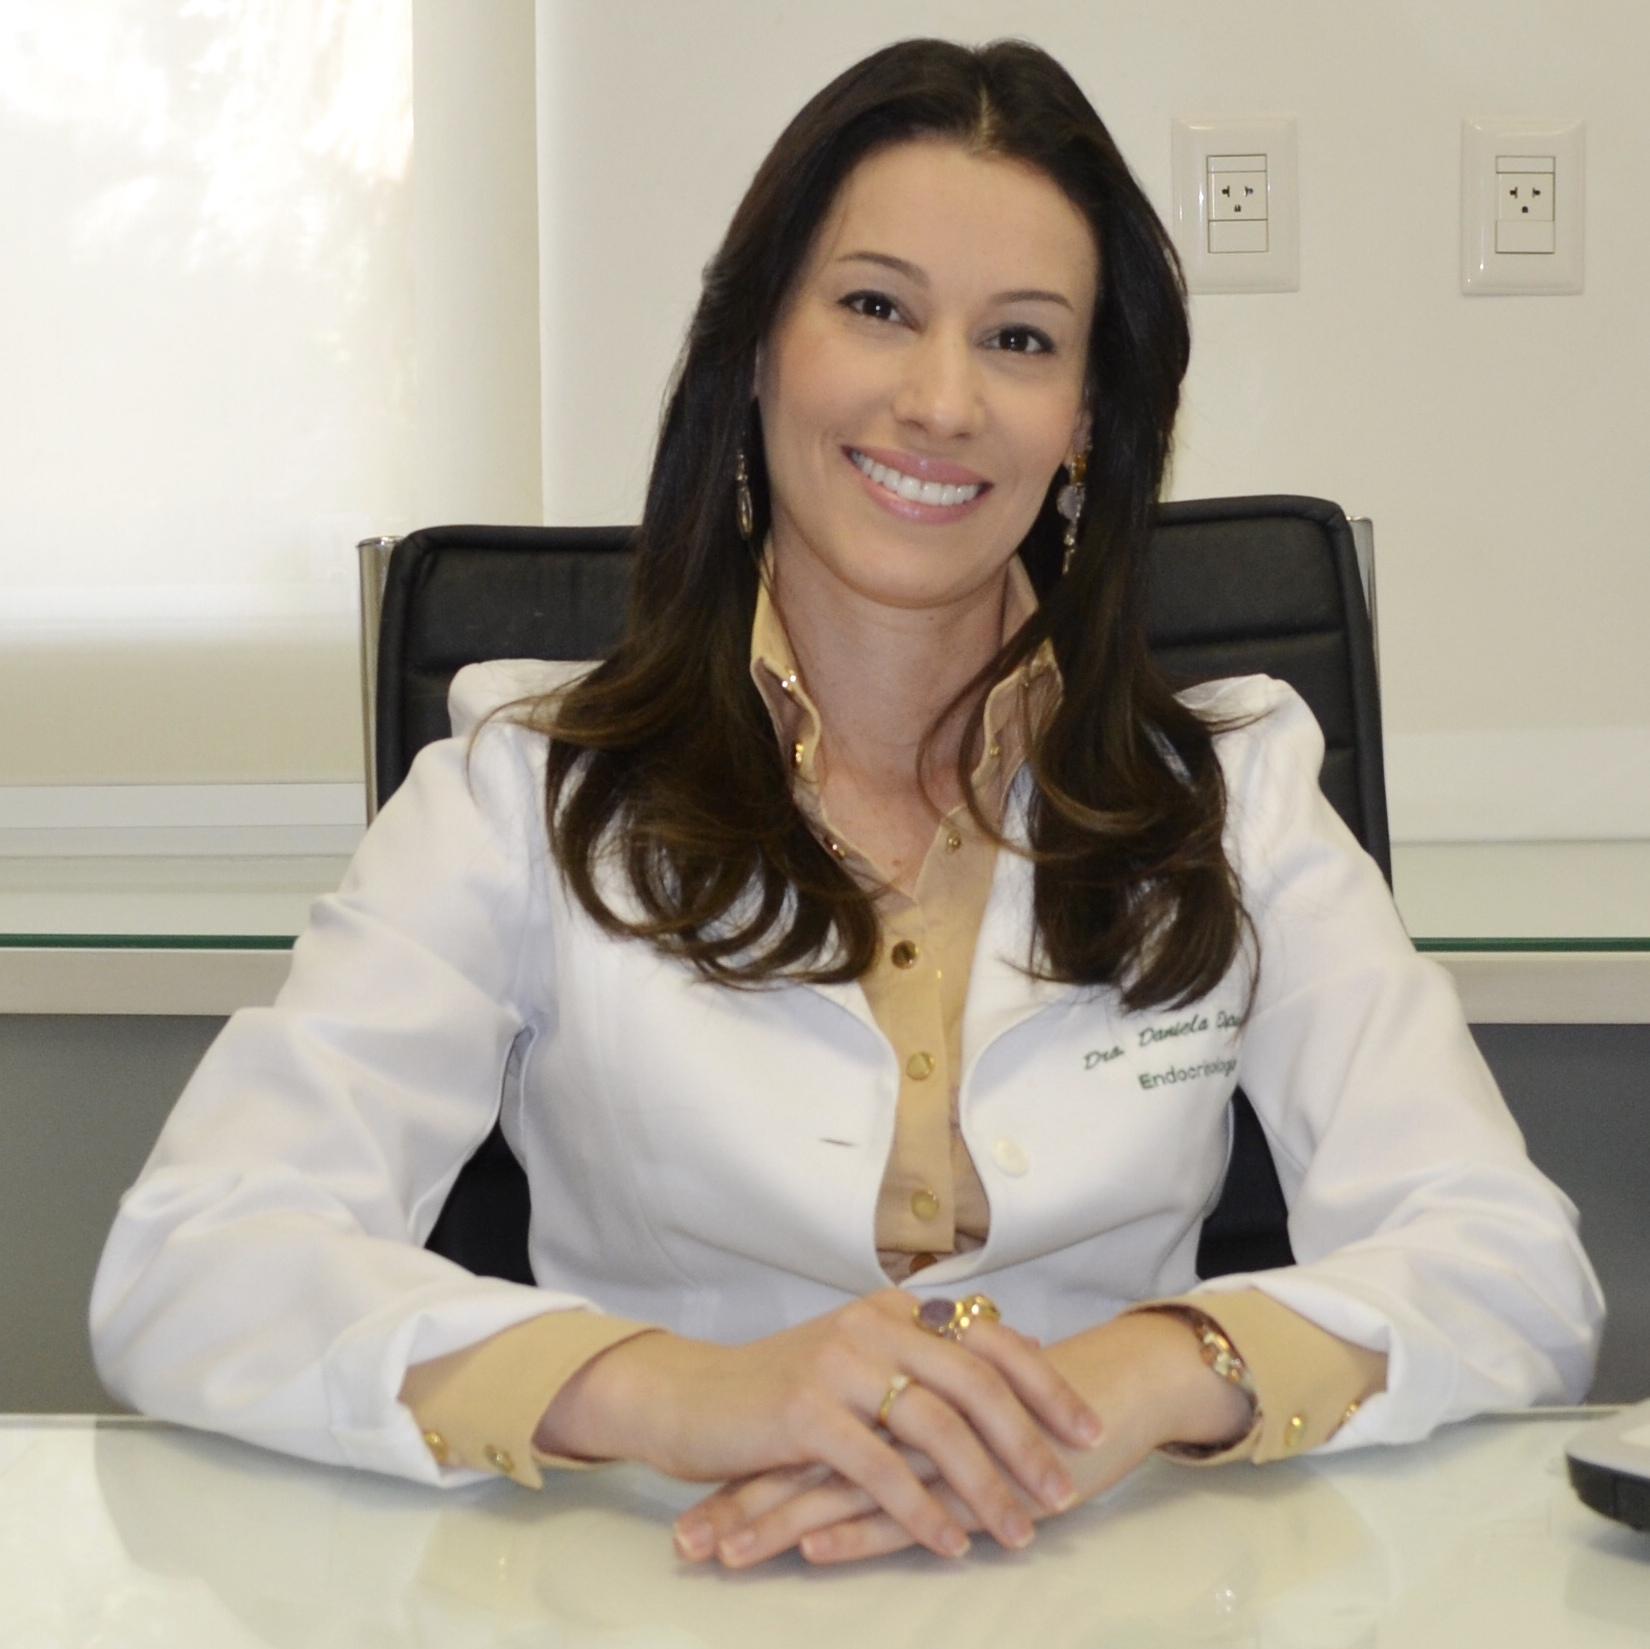 Daniela Espindola Antunes